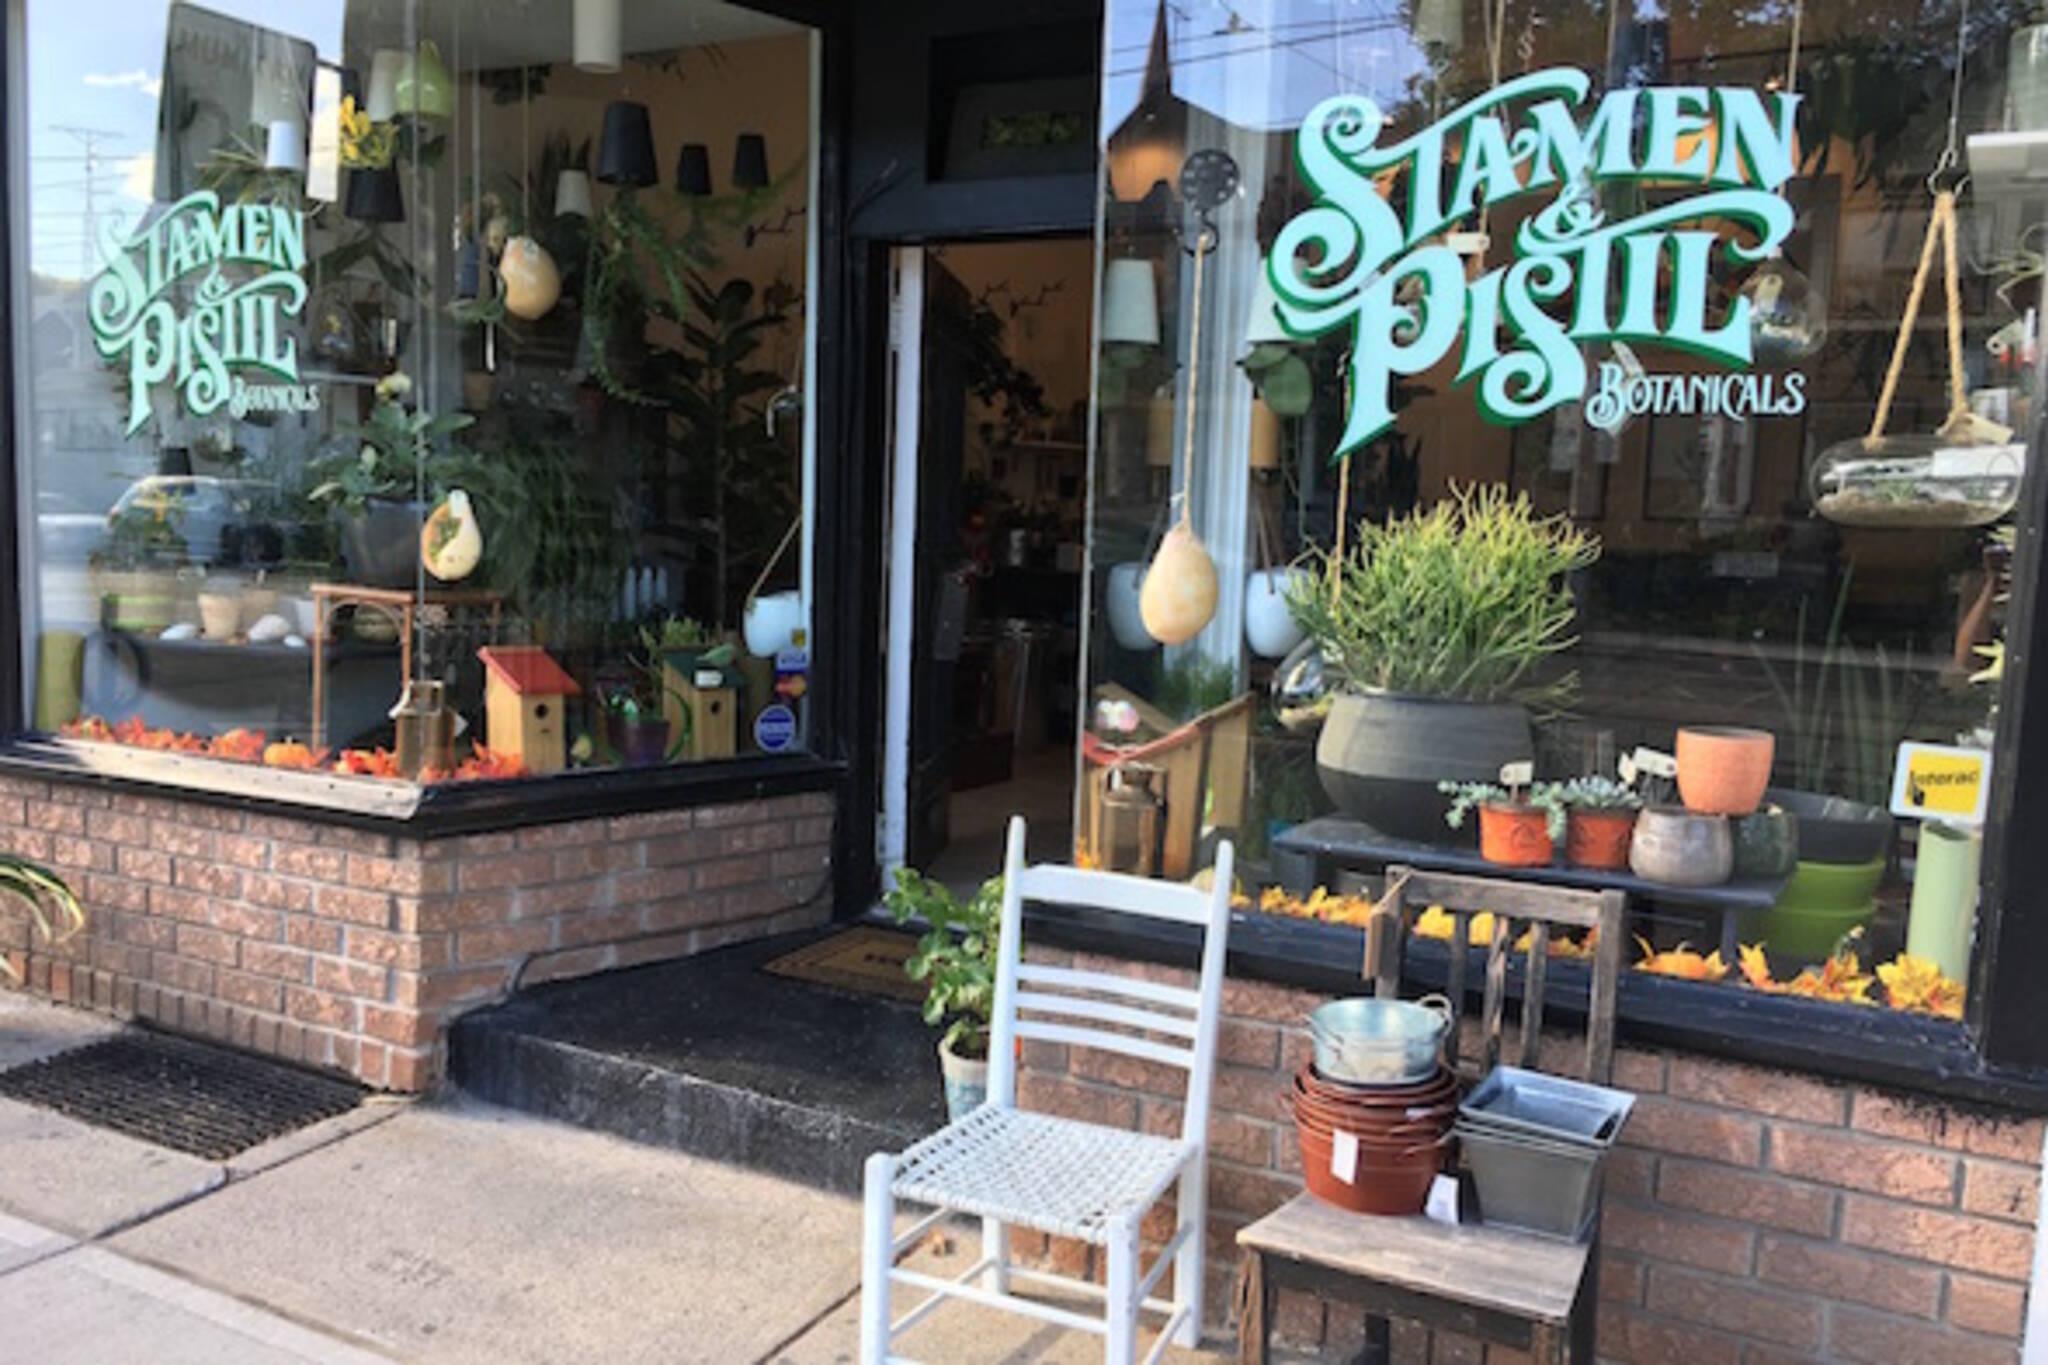 Stamen Pistil Botanicals Toronto